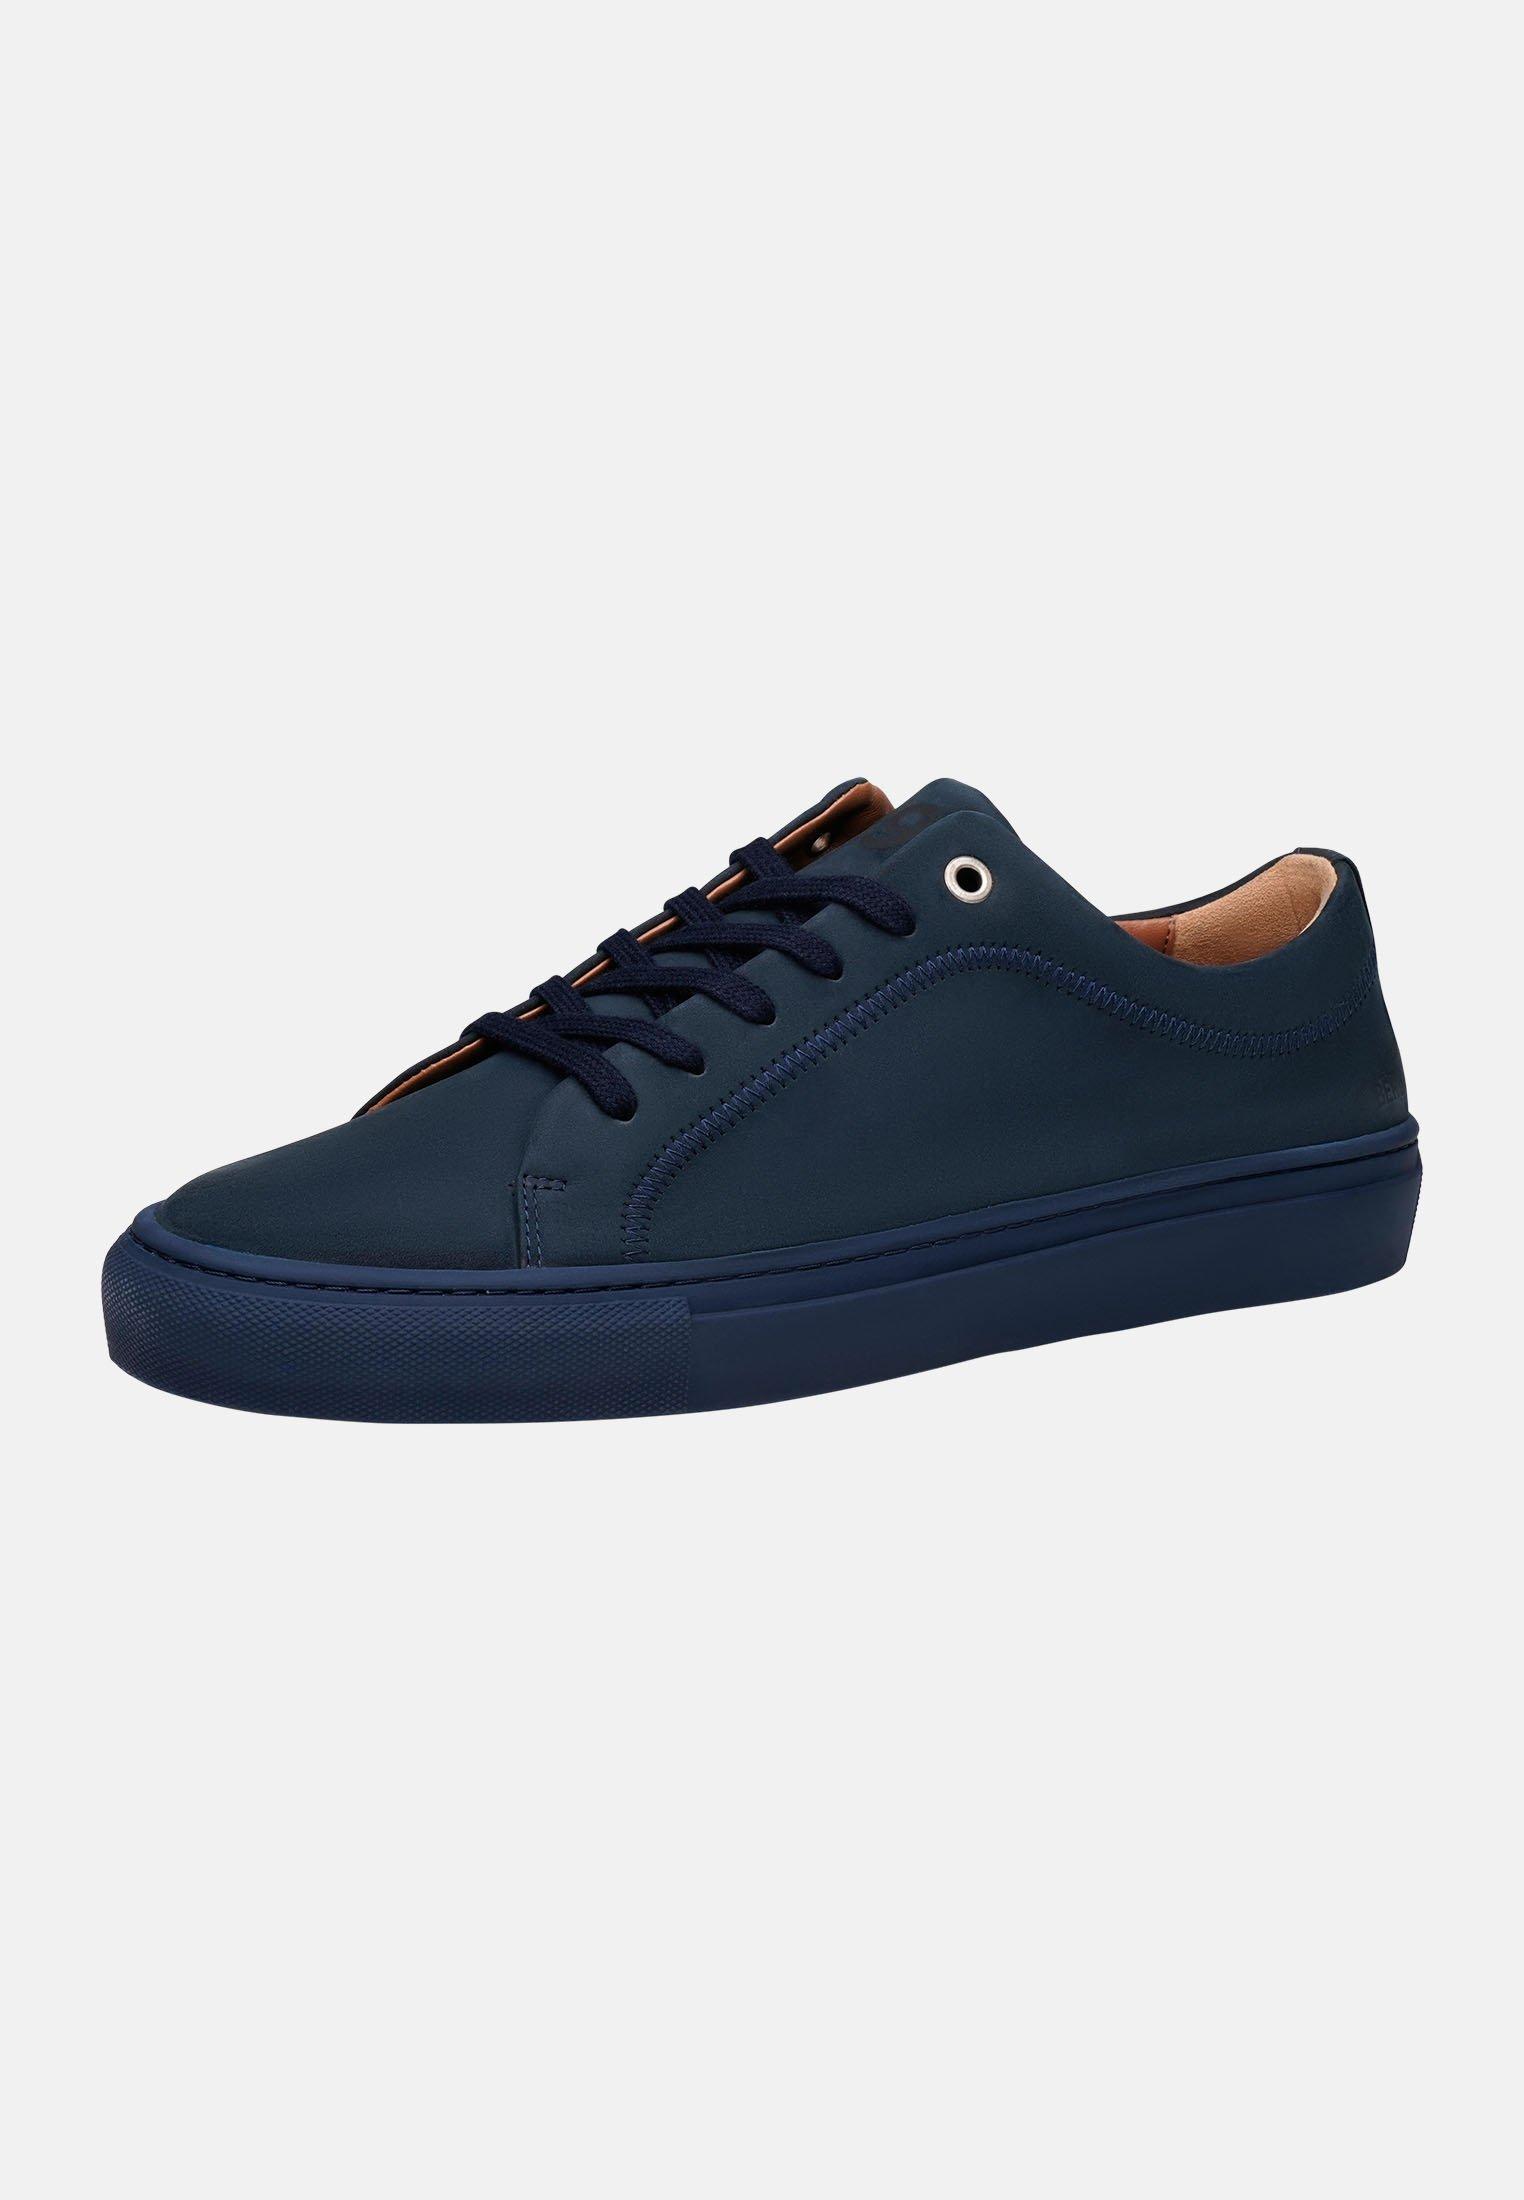 SHOEPASSION NO. 125 MS - Sneaker low - dunkelblau - Herrenschuhe 0aIgm